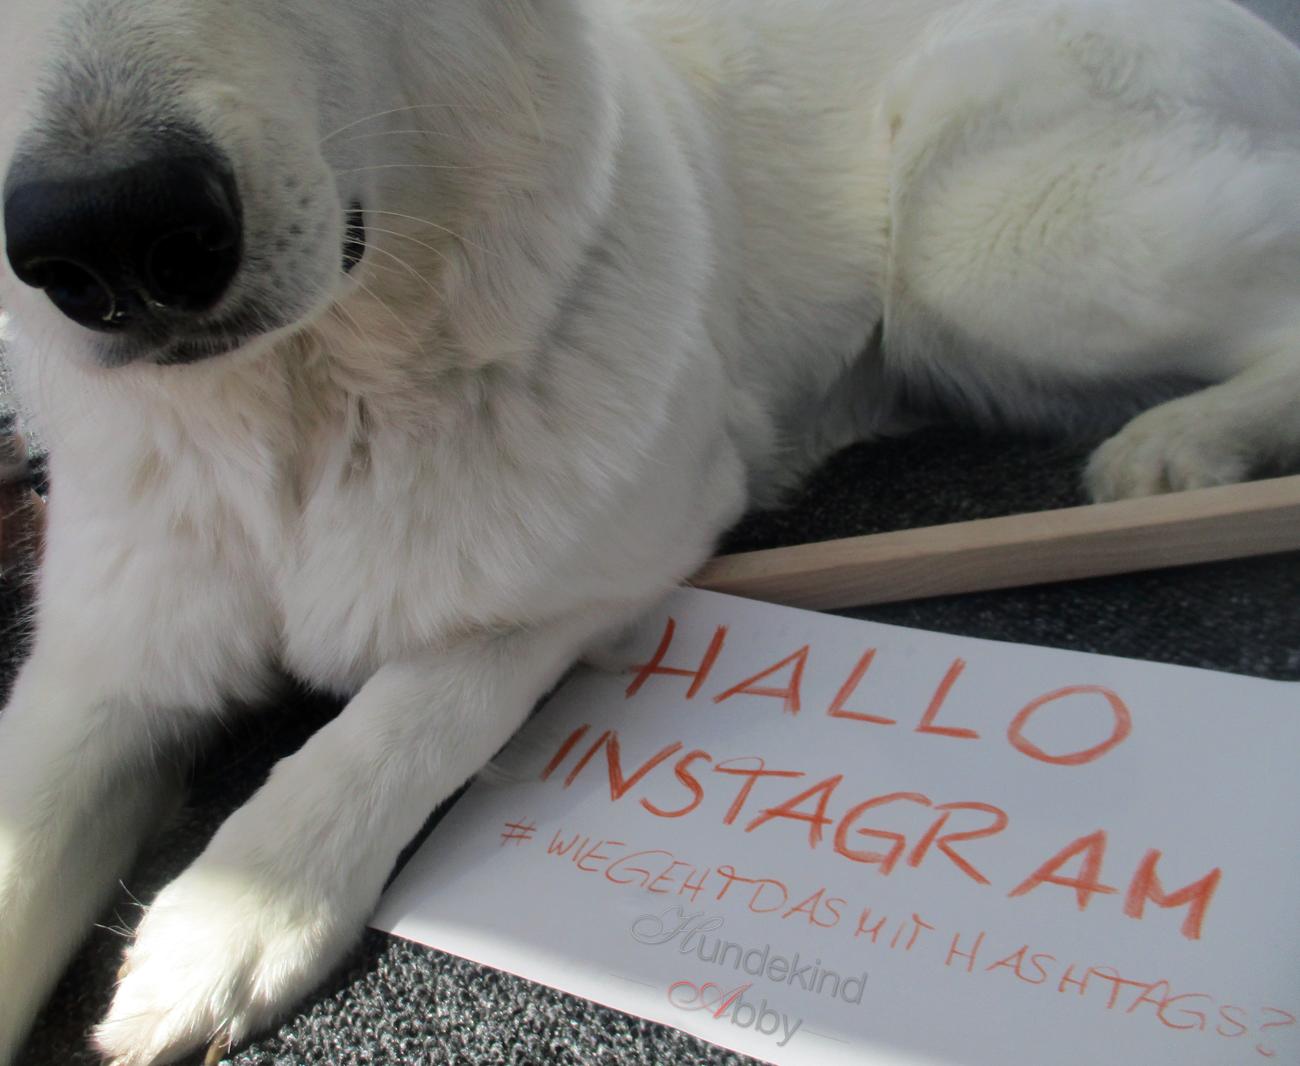 Hallo Instagramm Hundekind Abby